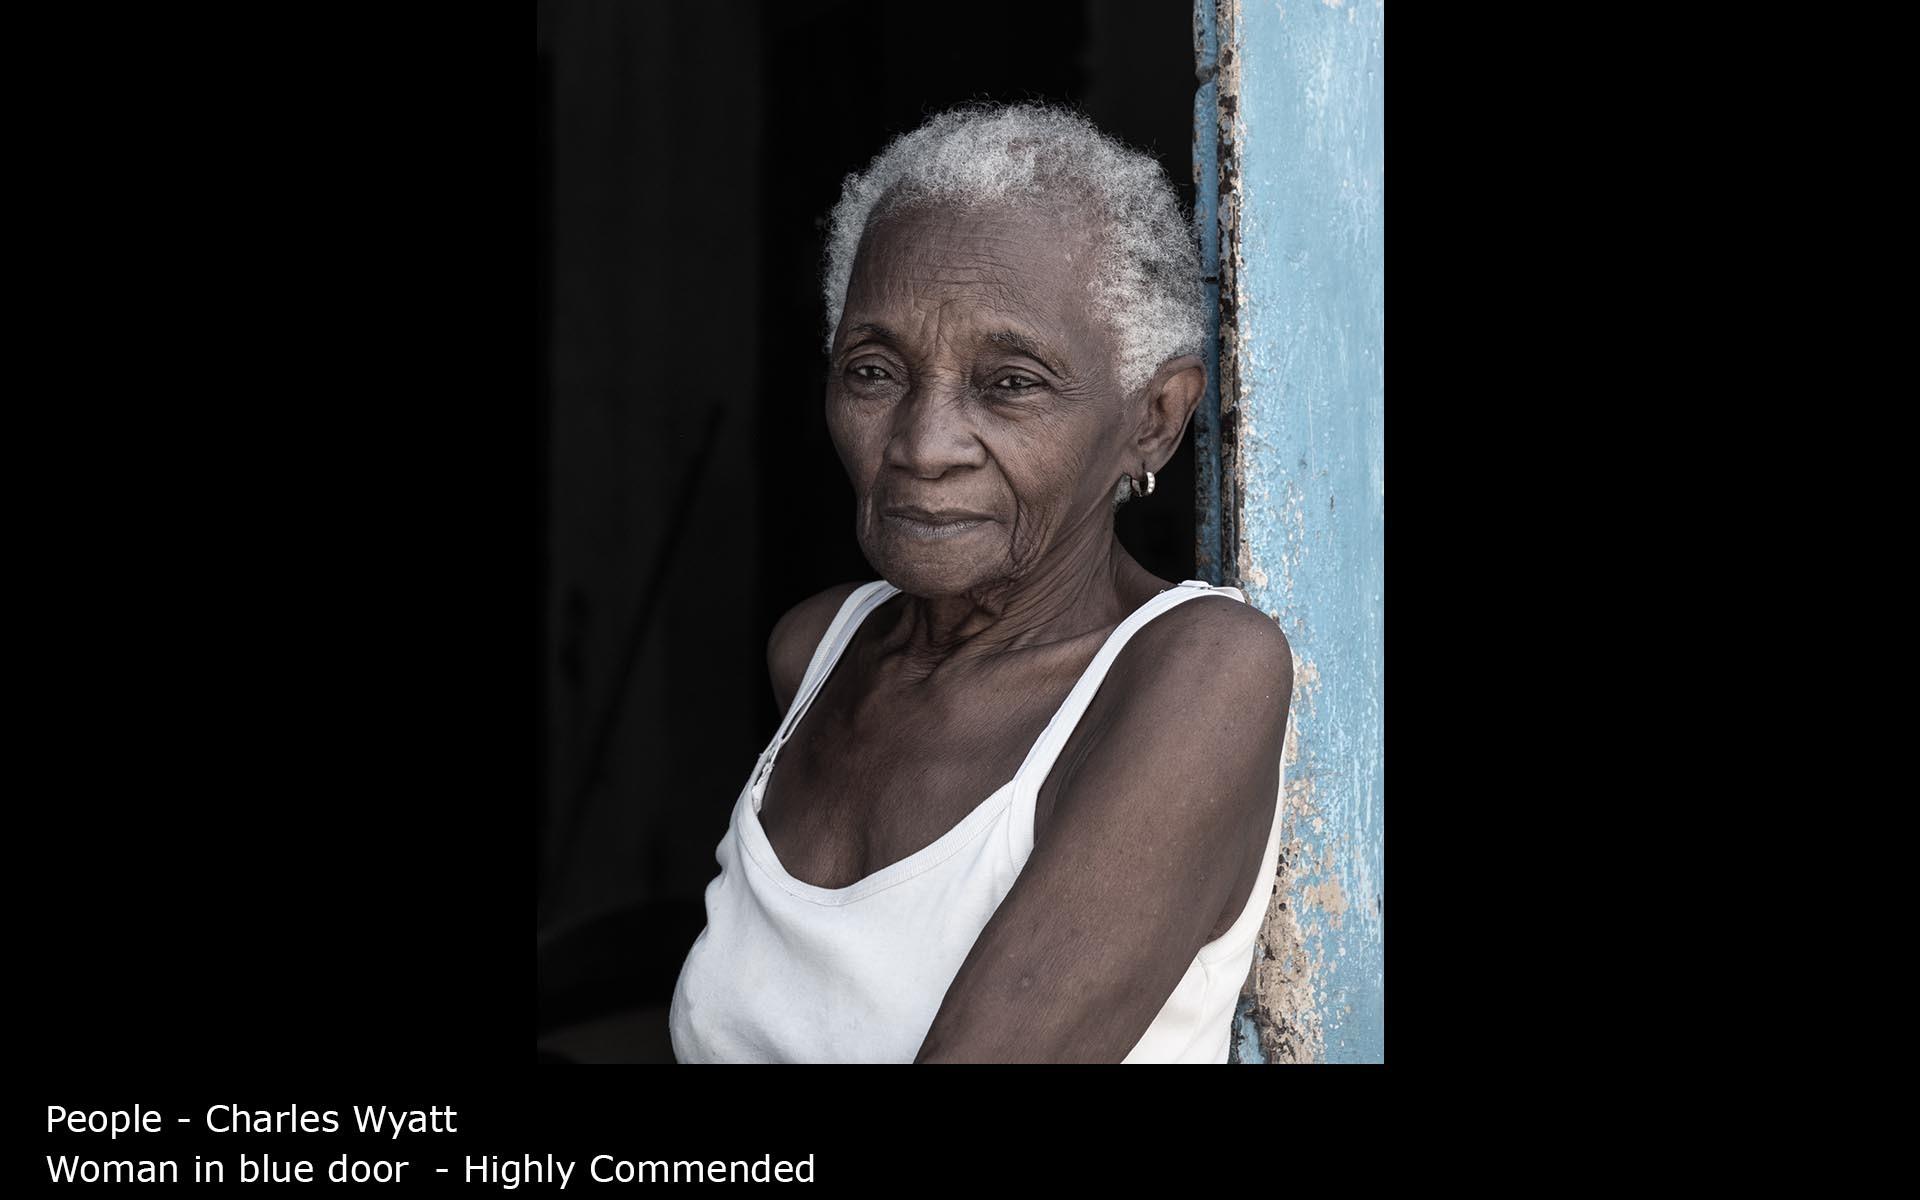 Woman in blue door  - Charles Wyatt